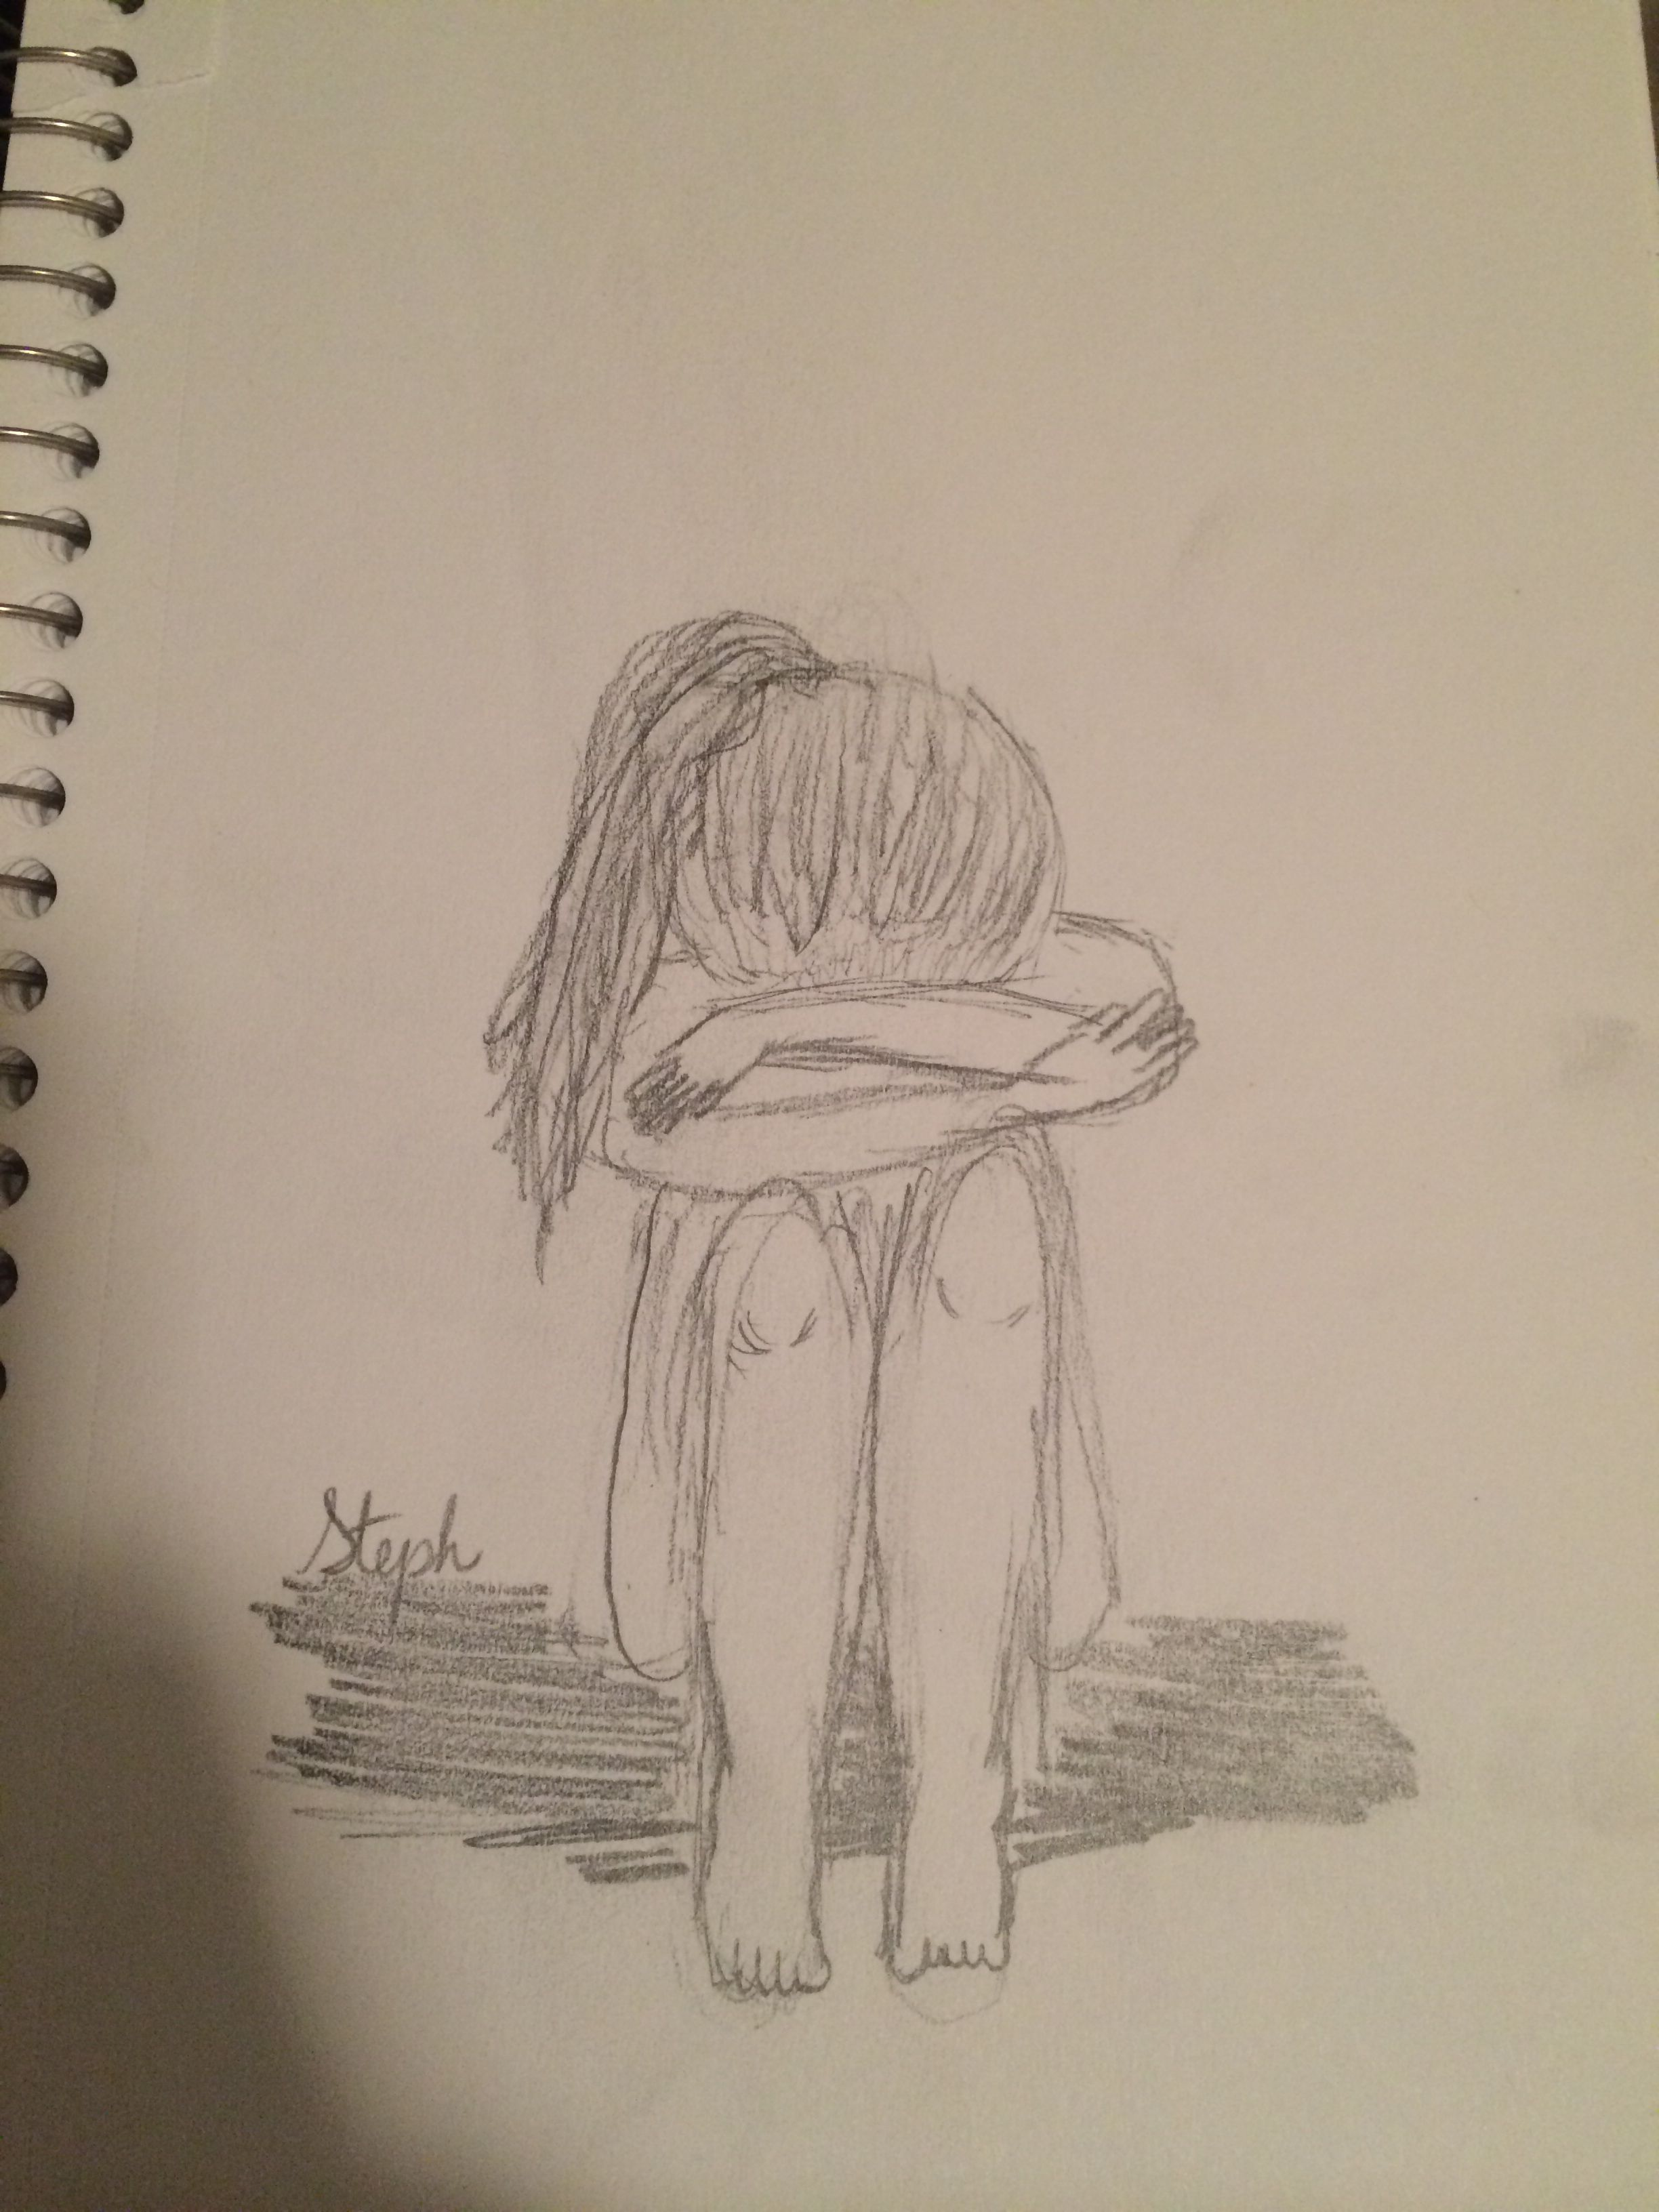 Sad girl crying drawing sketch